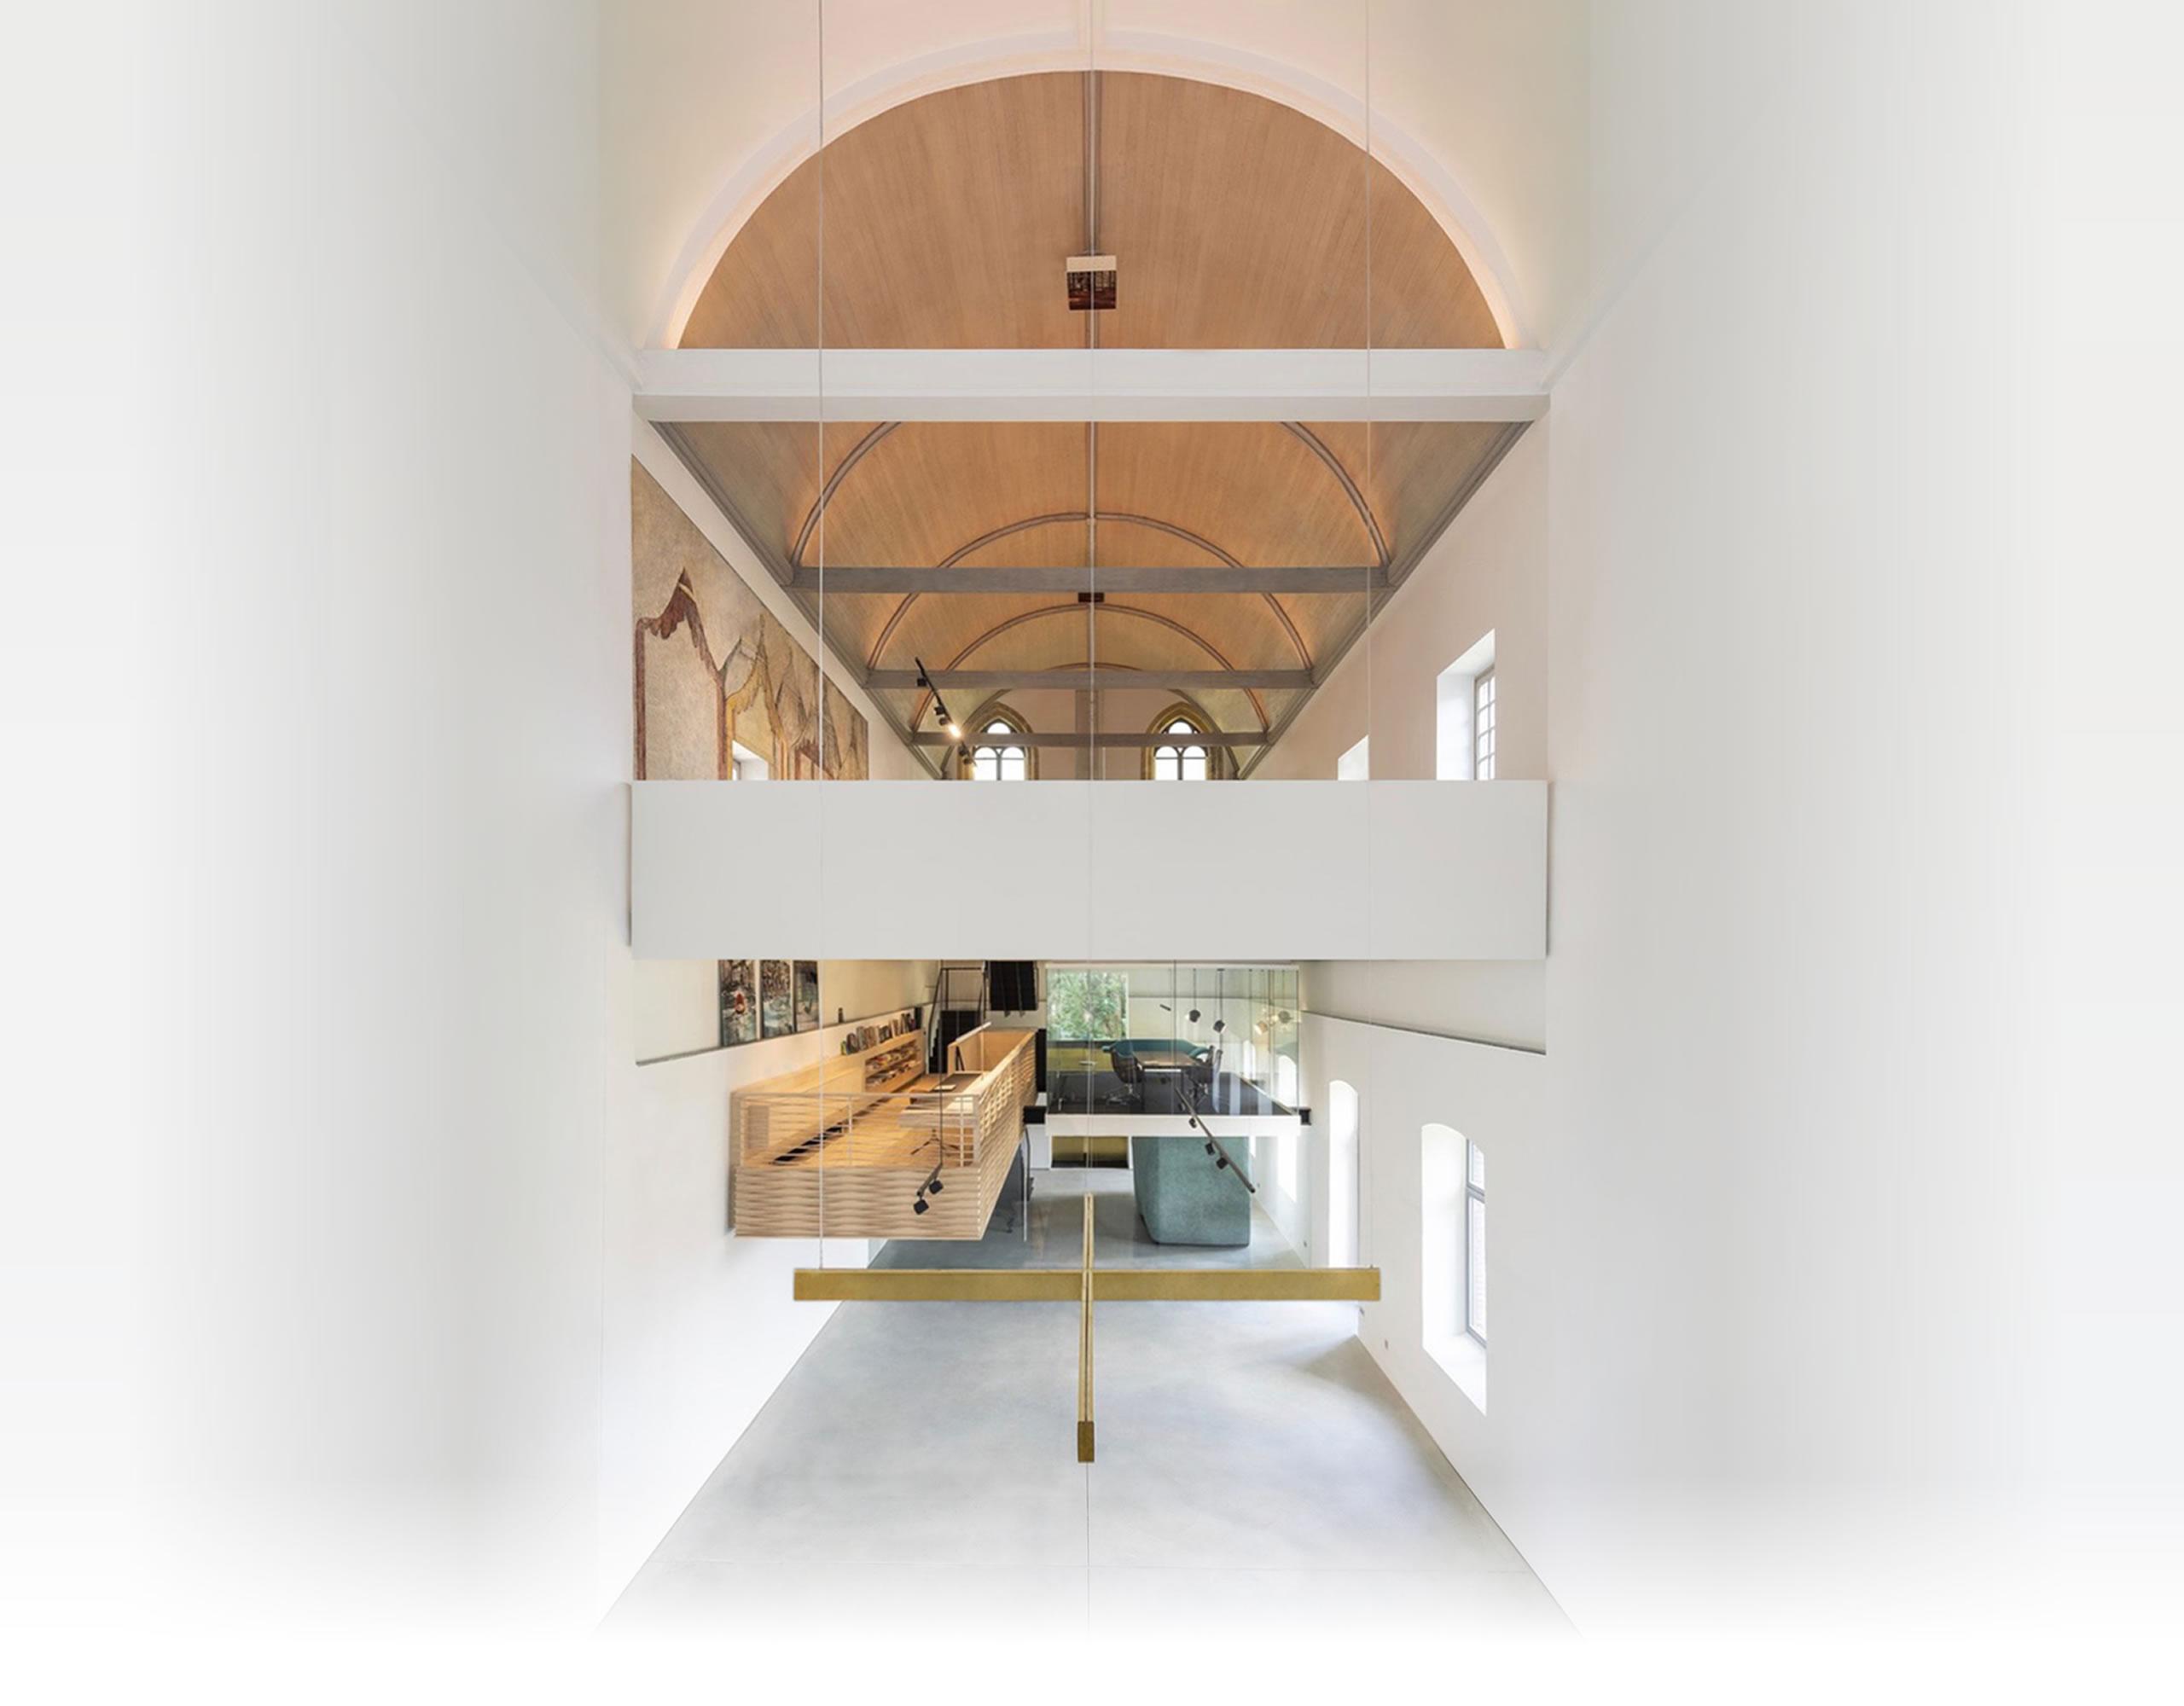 Andrieskapel, view inside